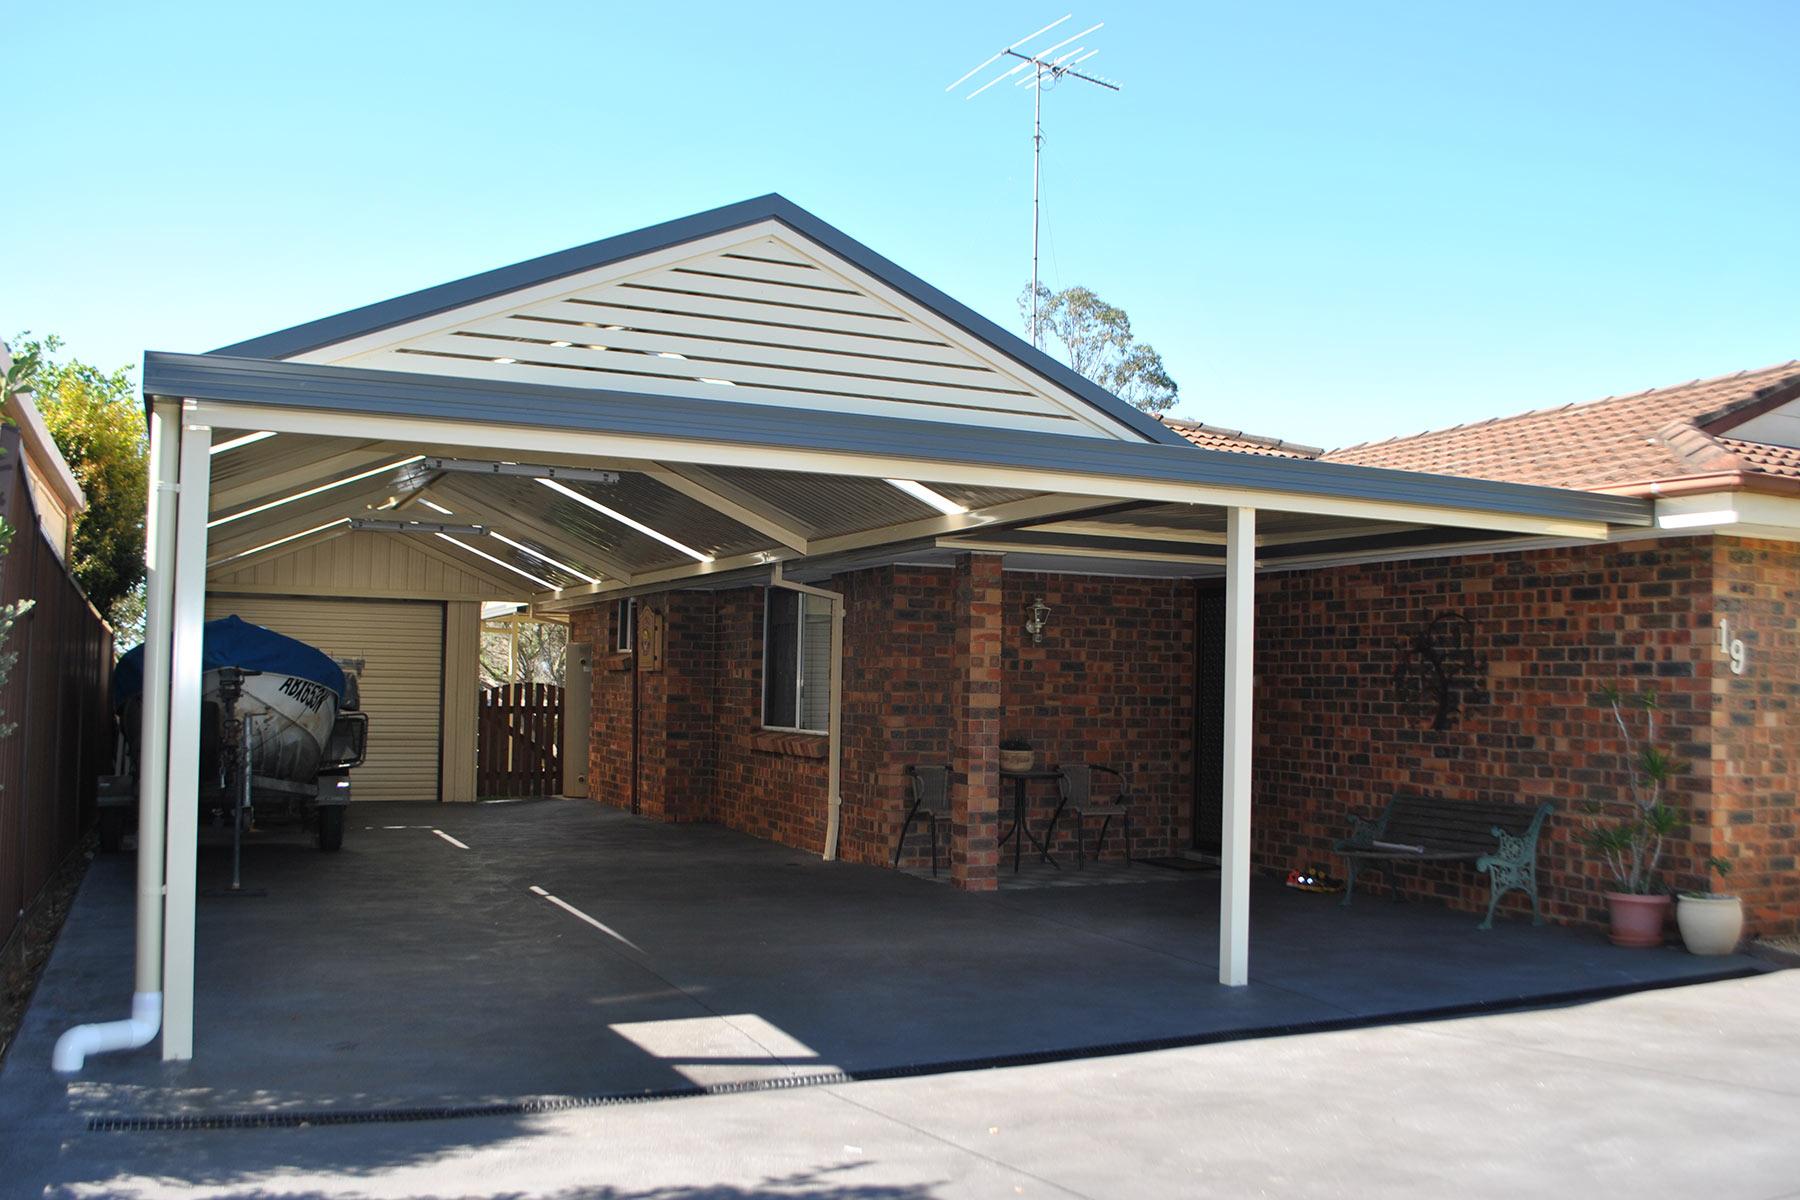 Carport Roofing Options 2022